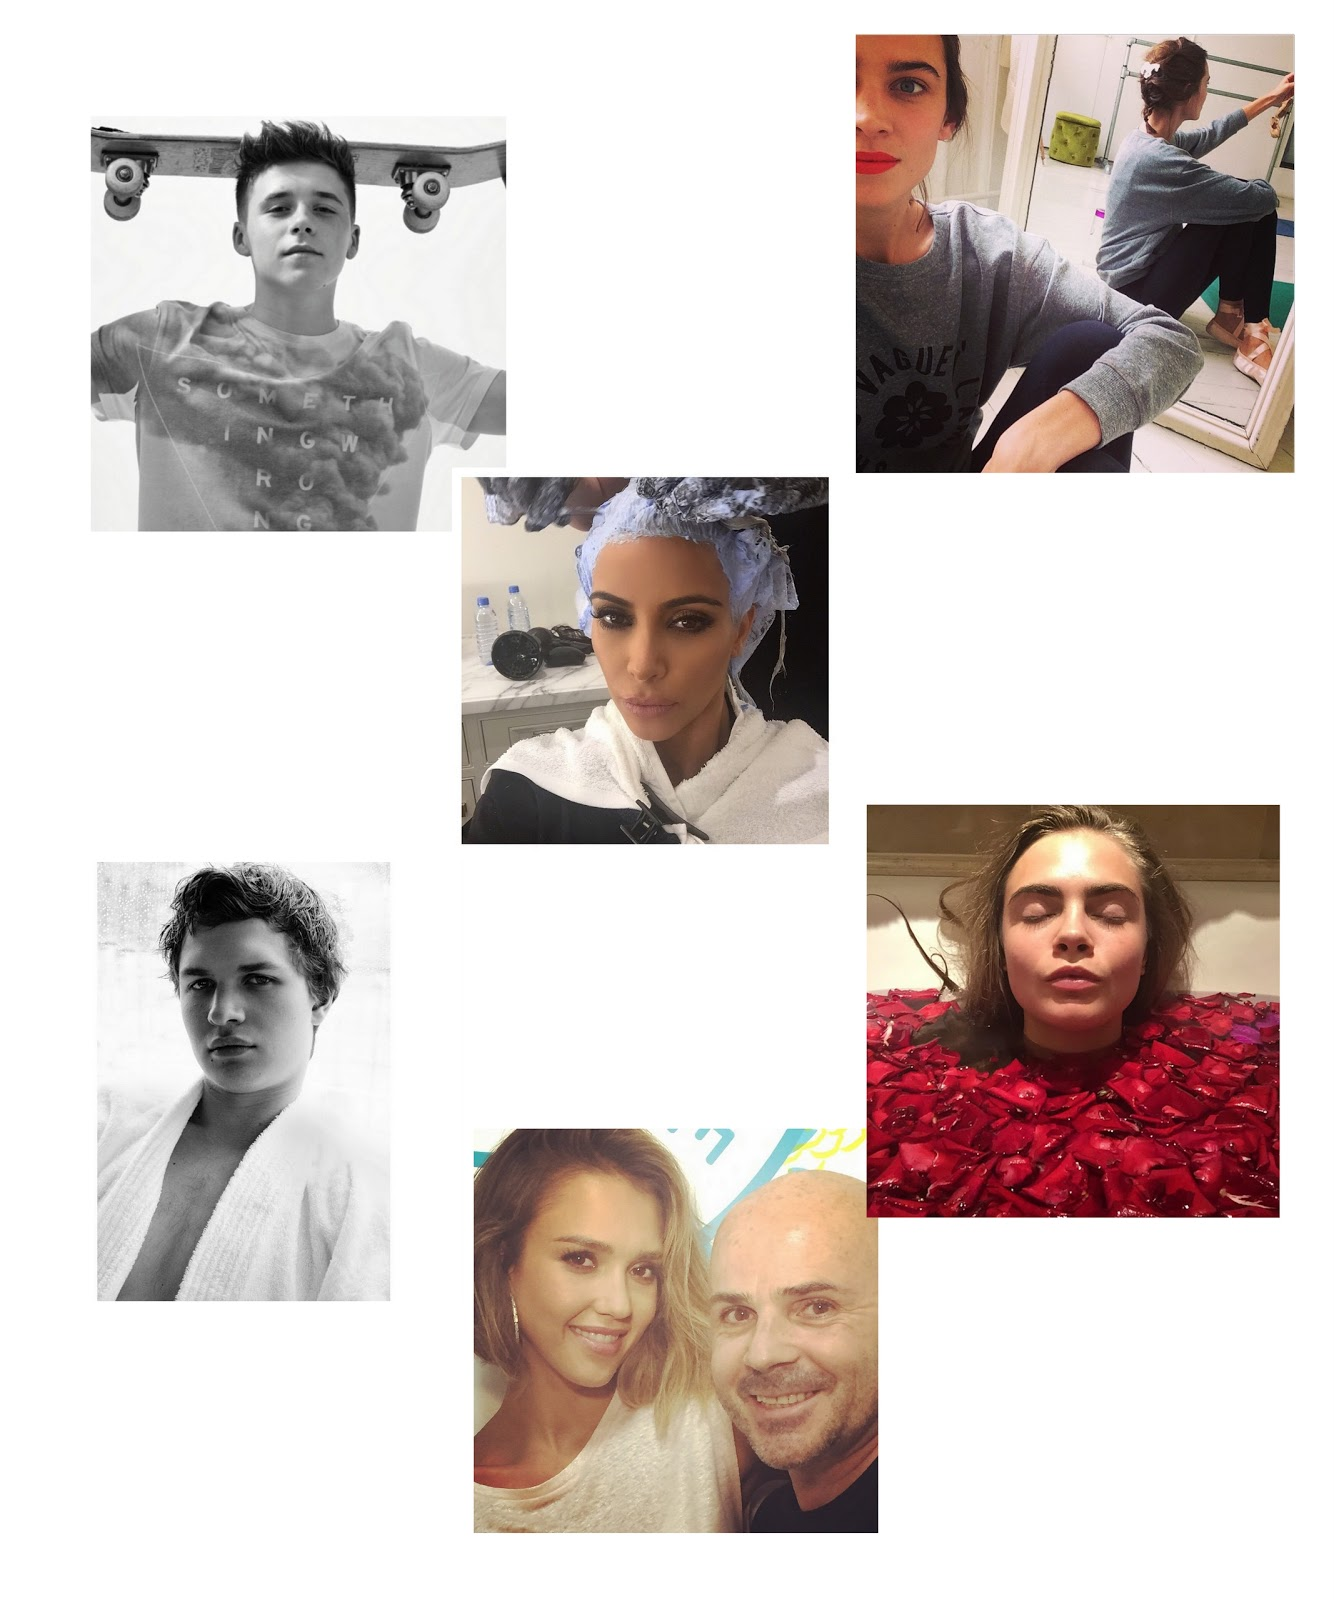 instagram, favourites, deau, blogger, dominique, candido, fashion, mode, jessica, alba, mario, testino, kim, kardashian, brooklyn, beckham, alexa, chung, cara, delevingne